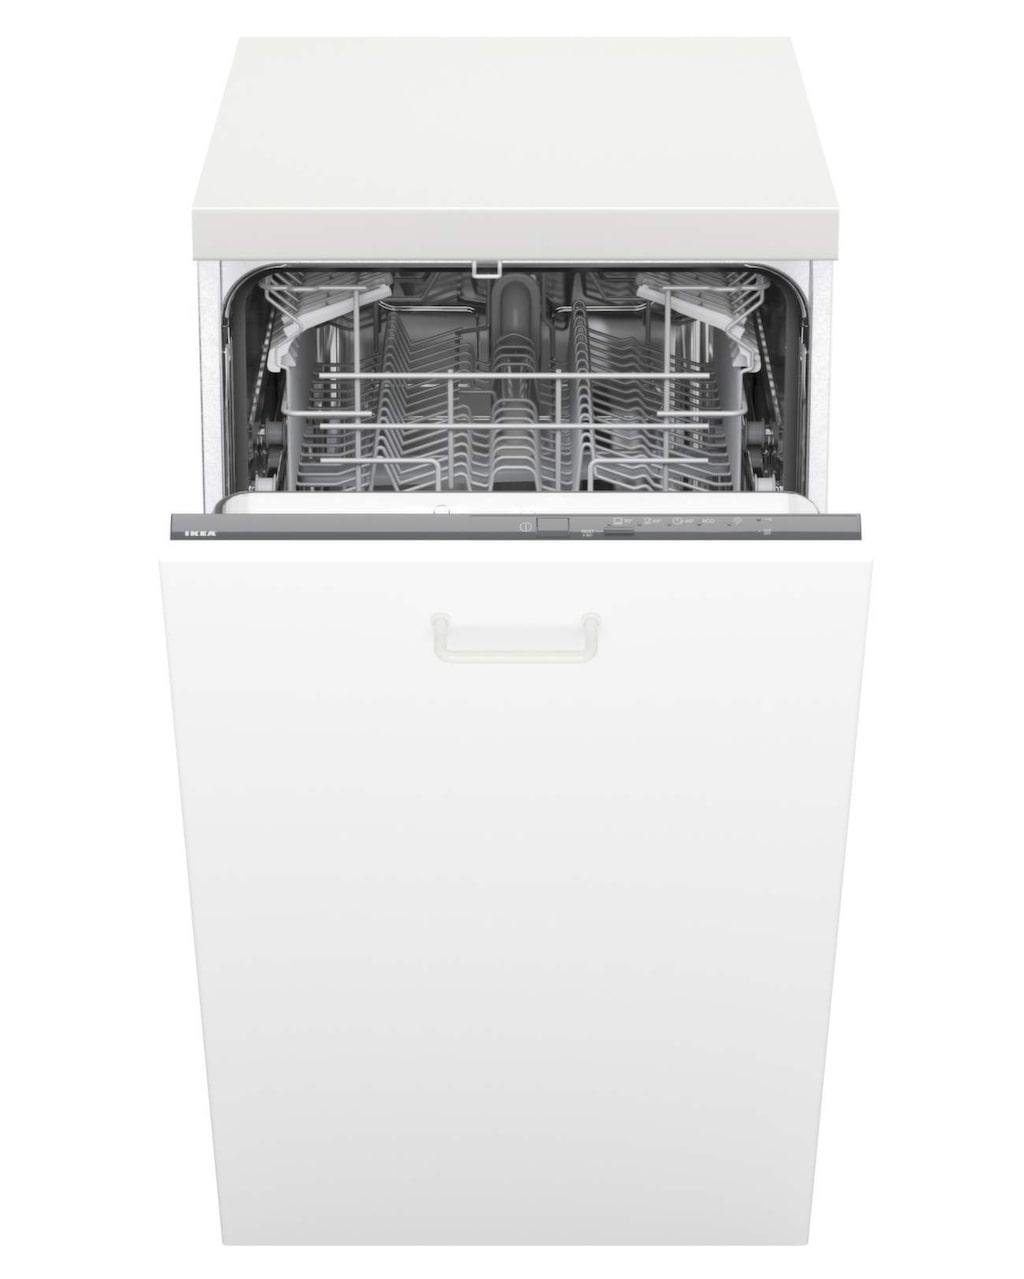 Smal integrerad diskmaskin Hjälpsam, 55,5 x 81,8 x 44,6 centimeter, 3 795 kronor, Ikea.